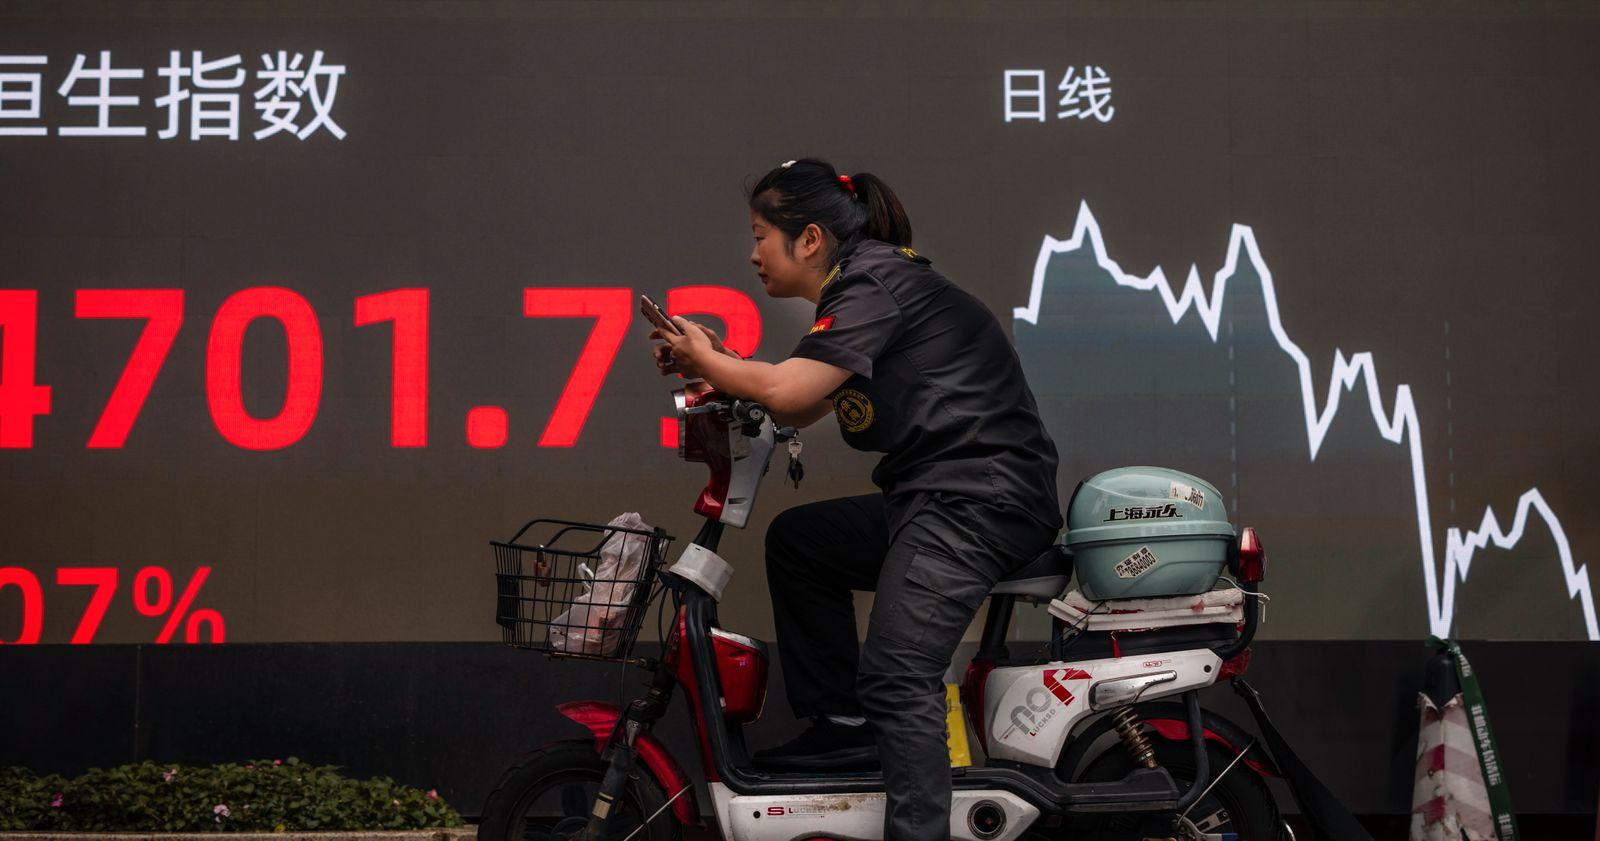 China?s stock market debt crisis